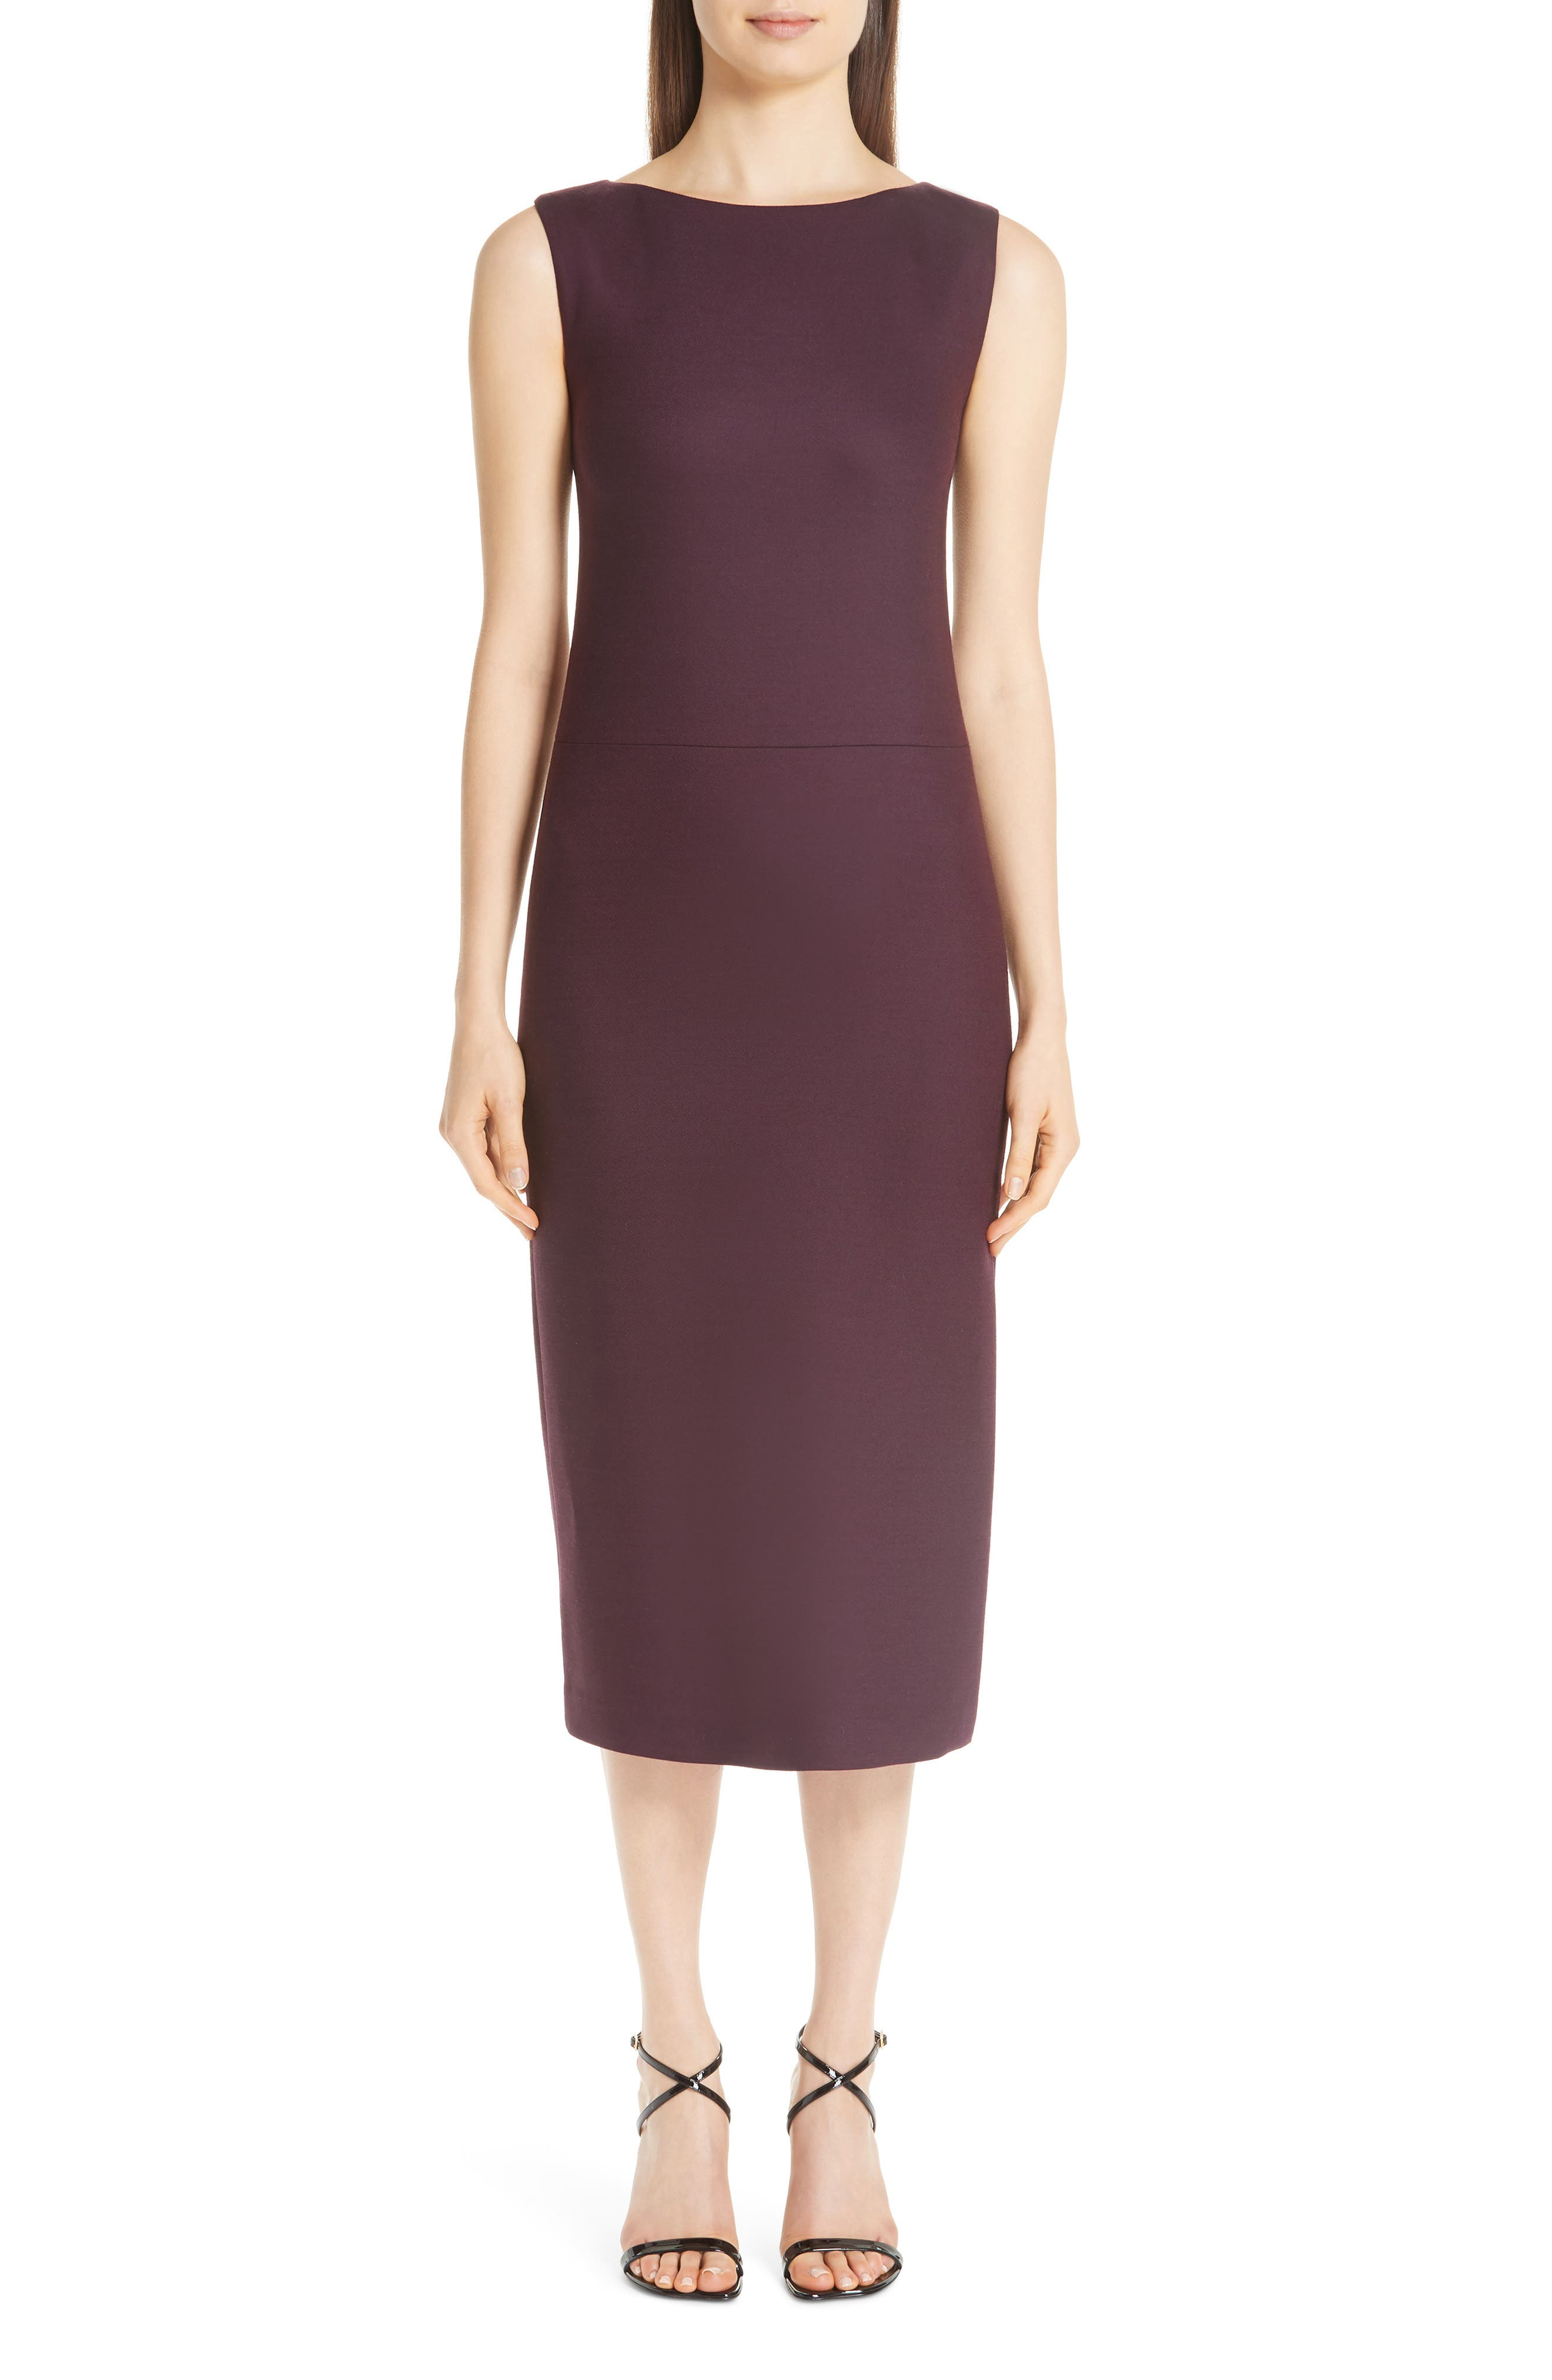 ADAM LIPPES,                             Double Face Wool Sheath Dress,                             Main thumbnail 1, color,                             BURGUNDY/ PINK